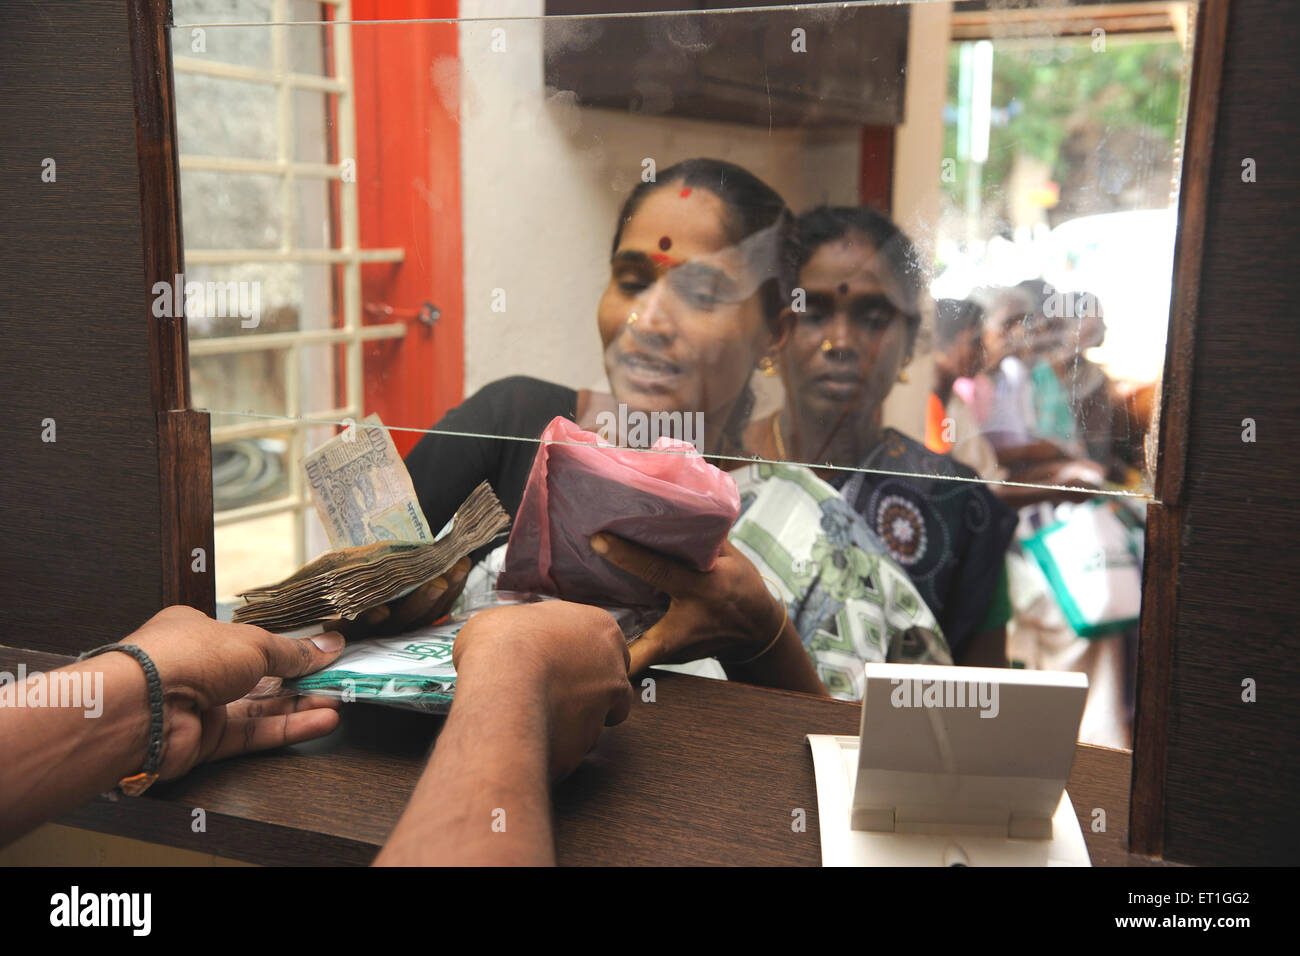 Payday loans in okeechobee photo 3